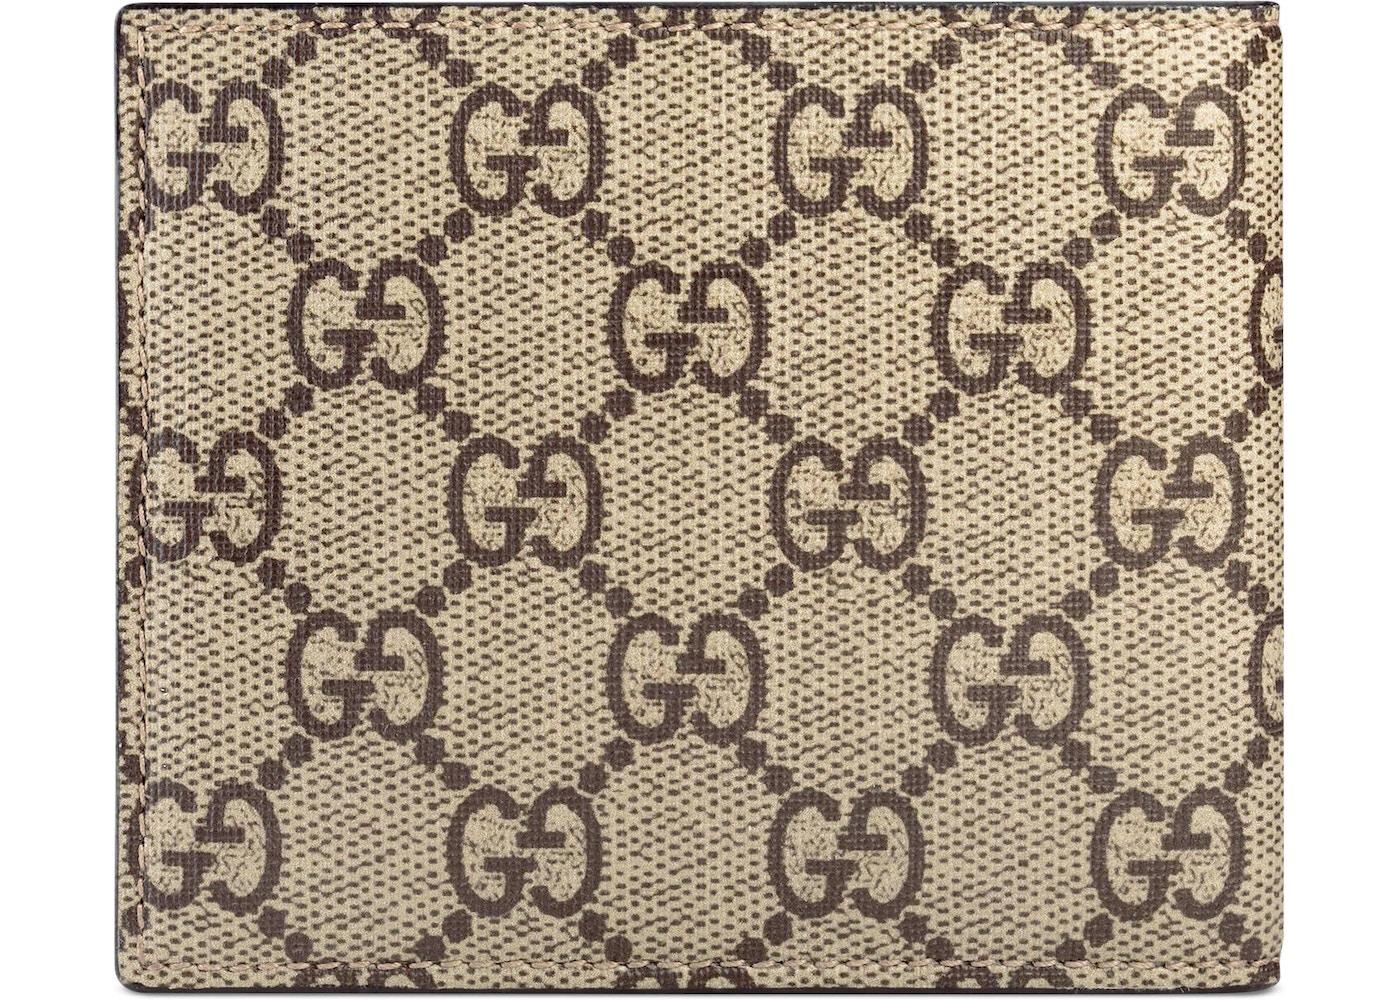 b98adb030e40 Gucci Bifold Wallet GG Supreme Angry Cat Print Beige